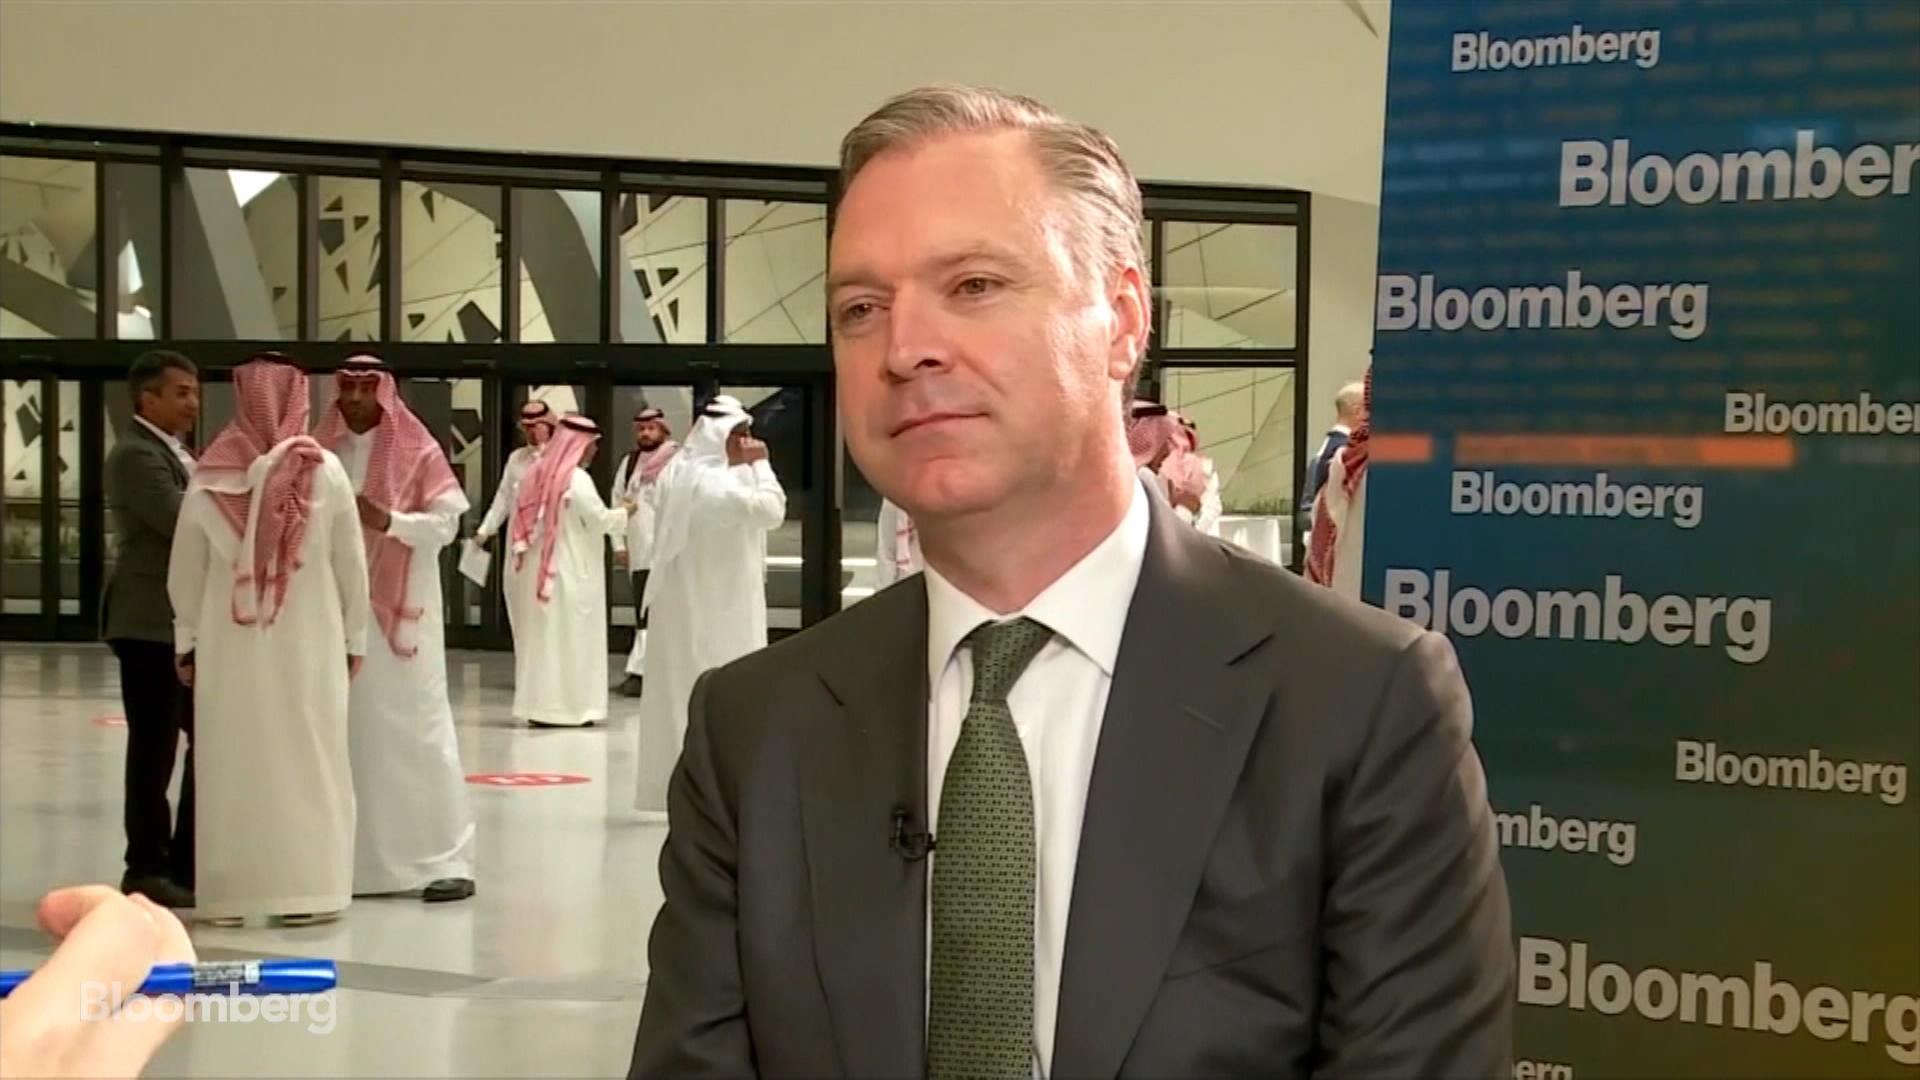 Maaden's Davis Talks Growth, Risks, and Saudi Arabia - Bloomberg